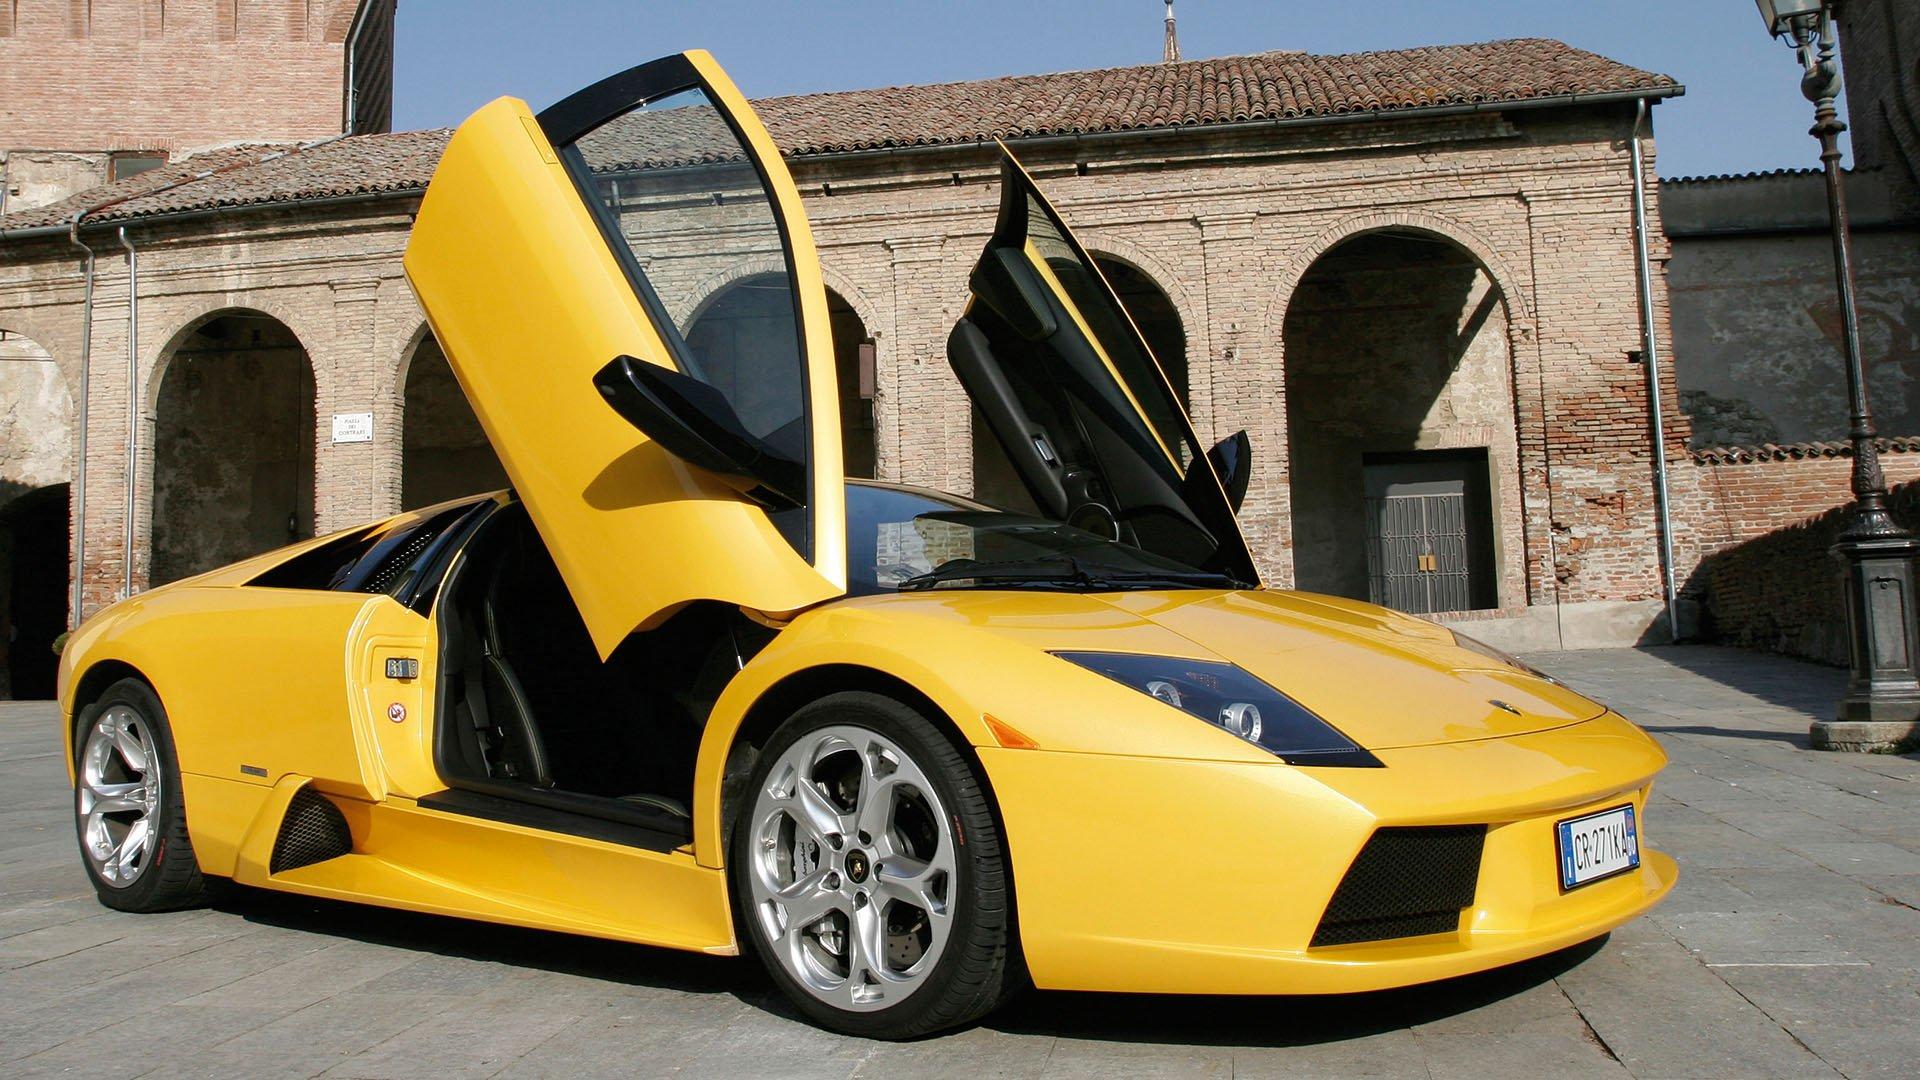 Lamborghini Murciélago with doors open